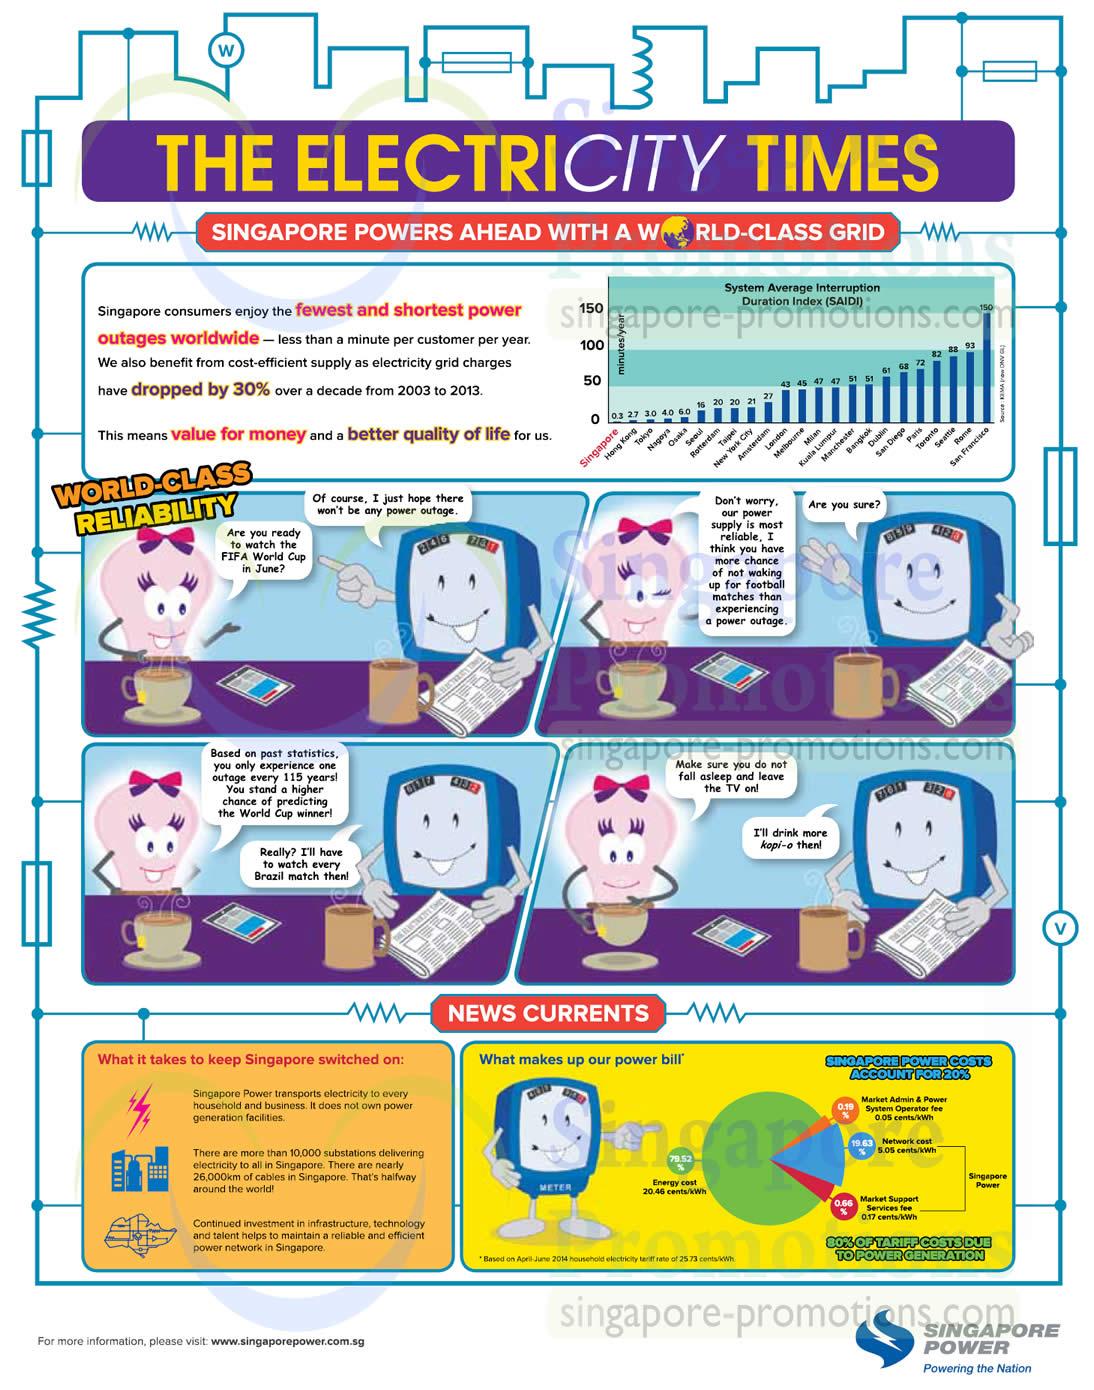 Singapore Electricity Reliability